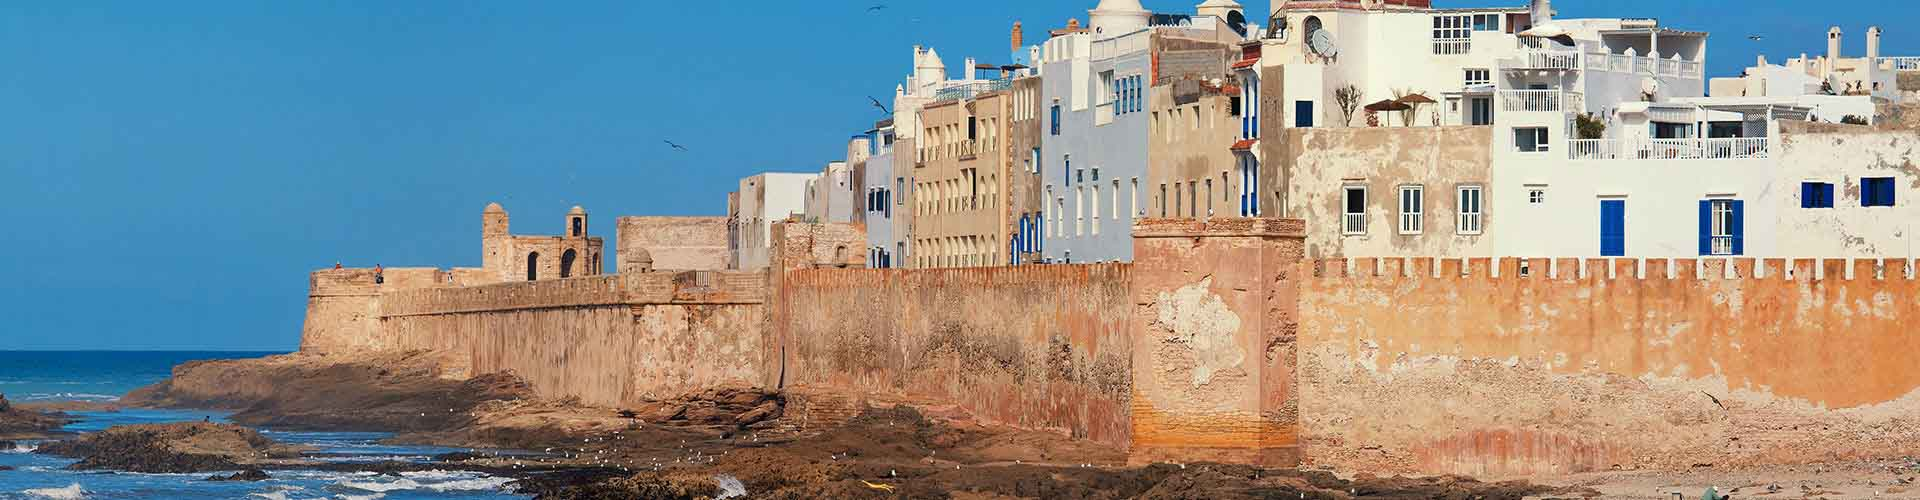 Essaouira - Hoteles baratos en Essaouira. Mapas de Essaouira, Fotos y comentarios de cada Hotel en Essaouira.